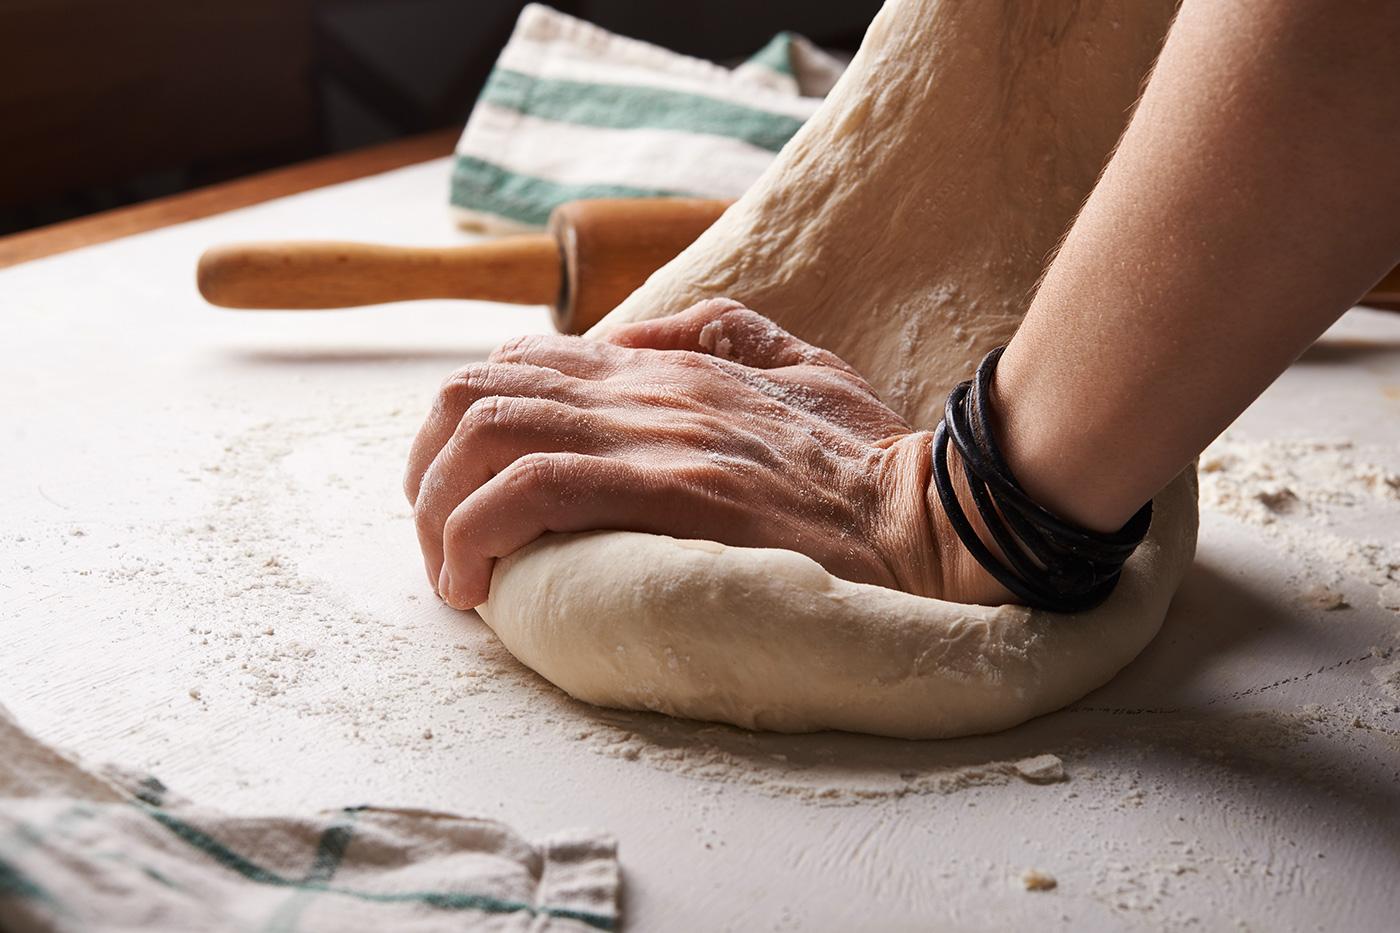 Preparación propio pan